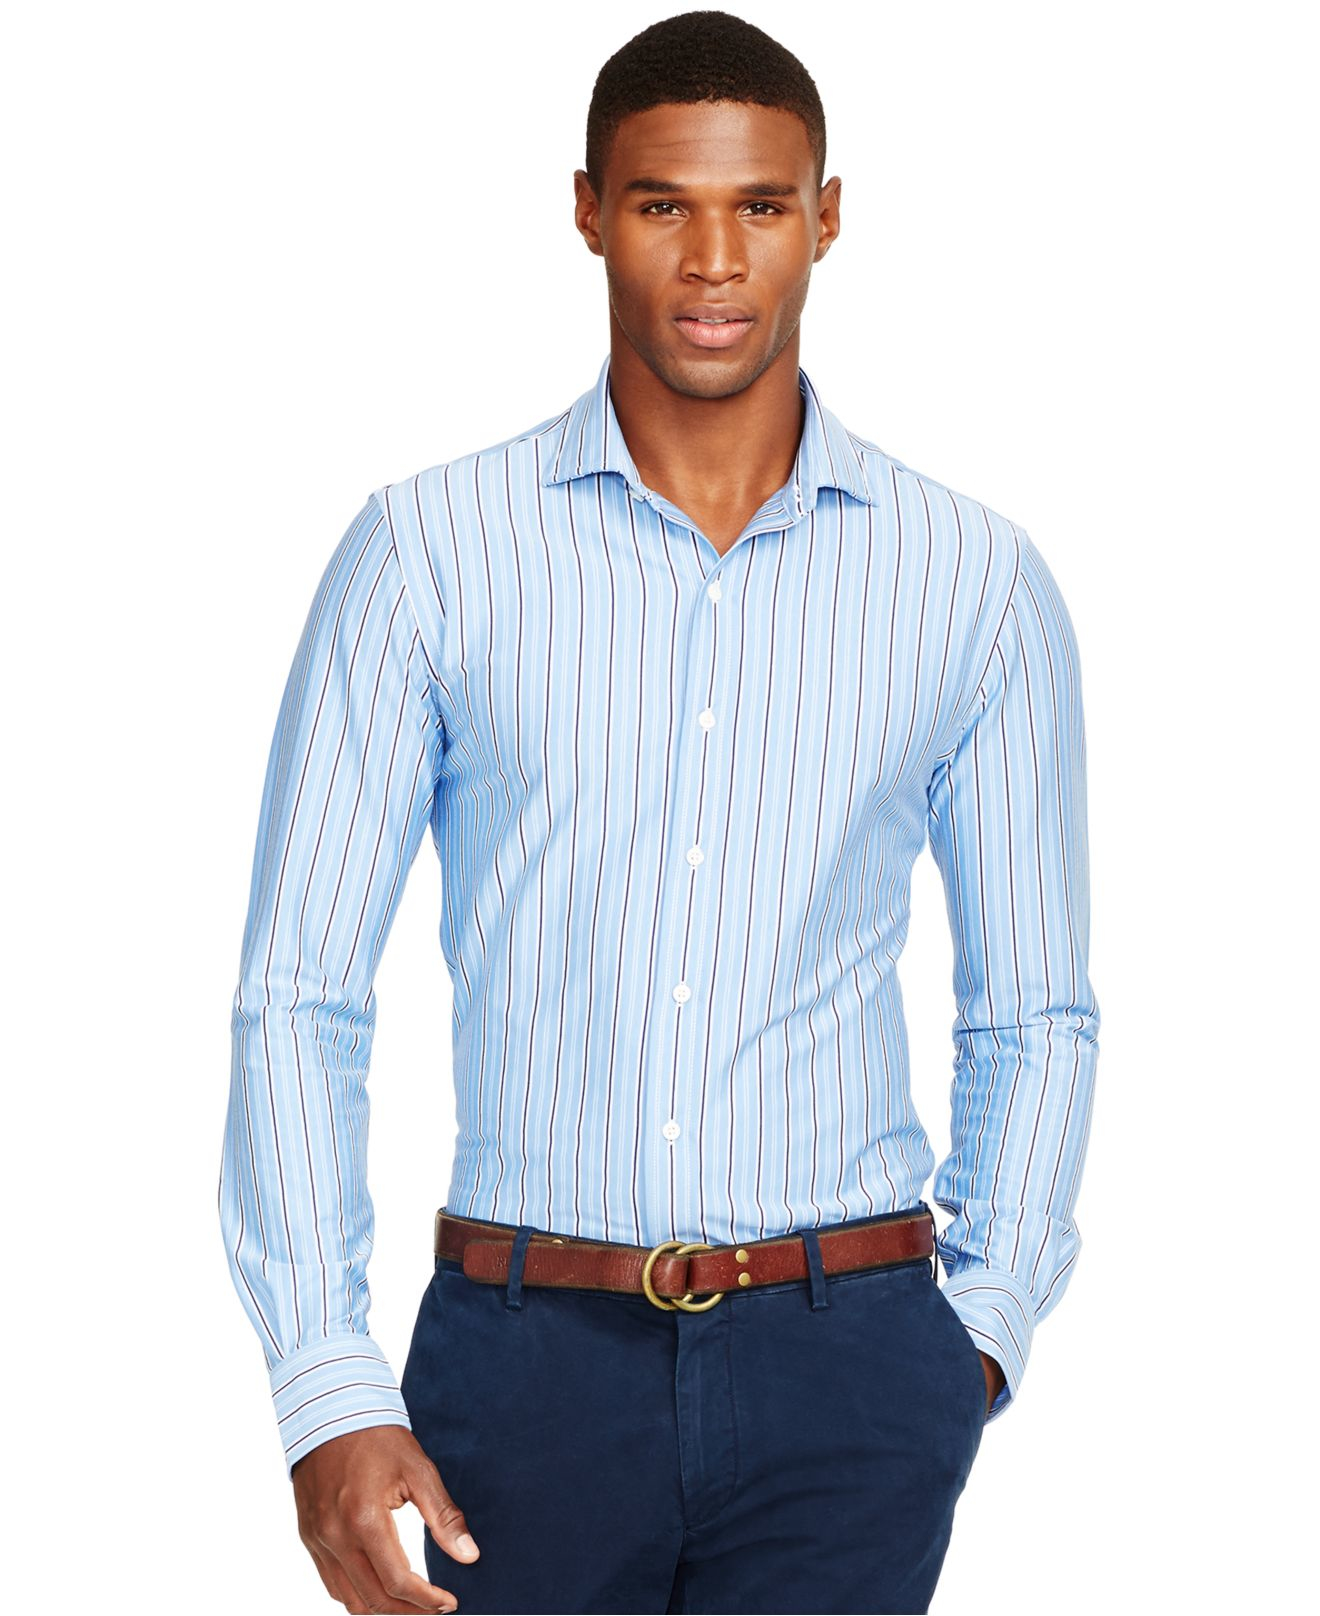 Lyst Polo Ralph Lauren Striped Knit Estate Dress Shirt In Blue For Men